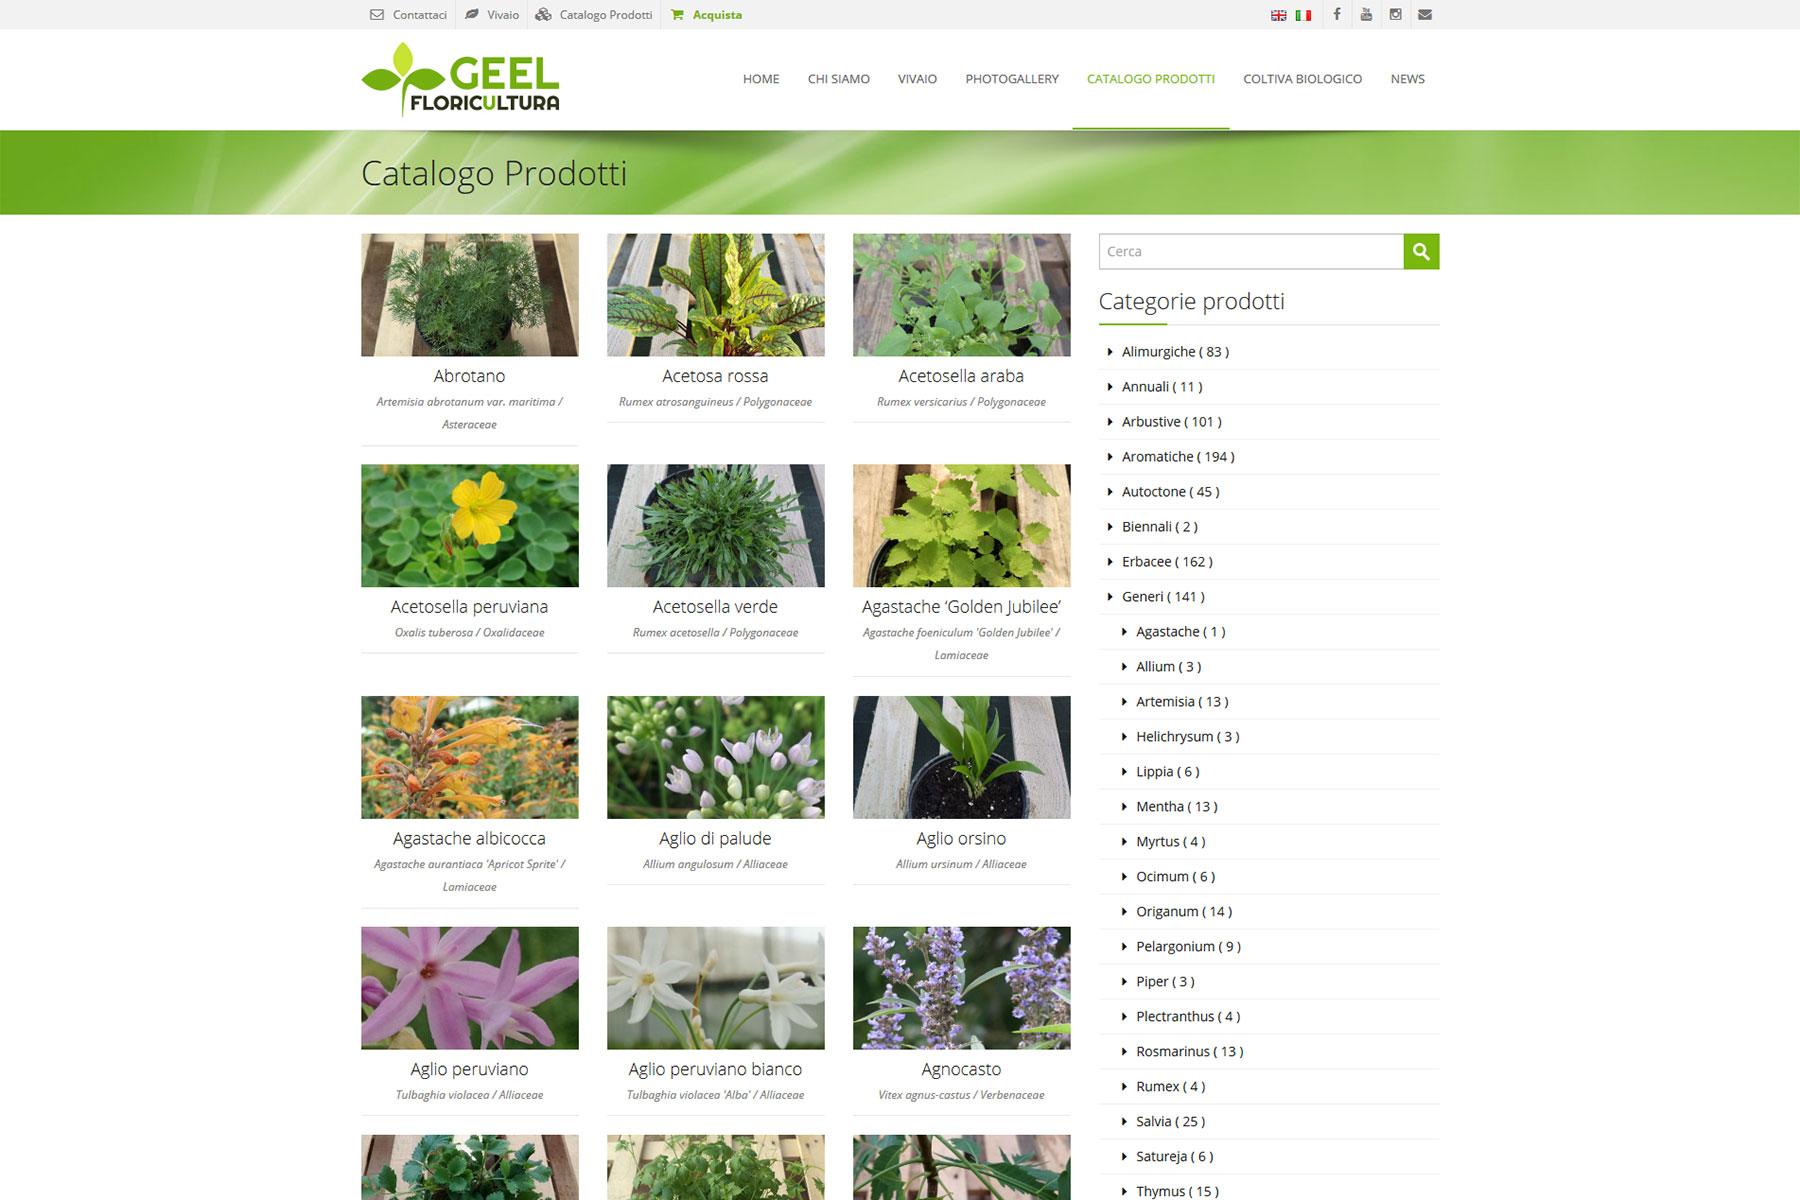 xplay-agenzia-web-sito-geel-floricoltura-carceri-padova